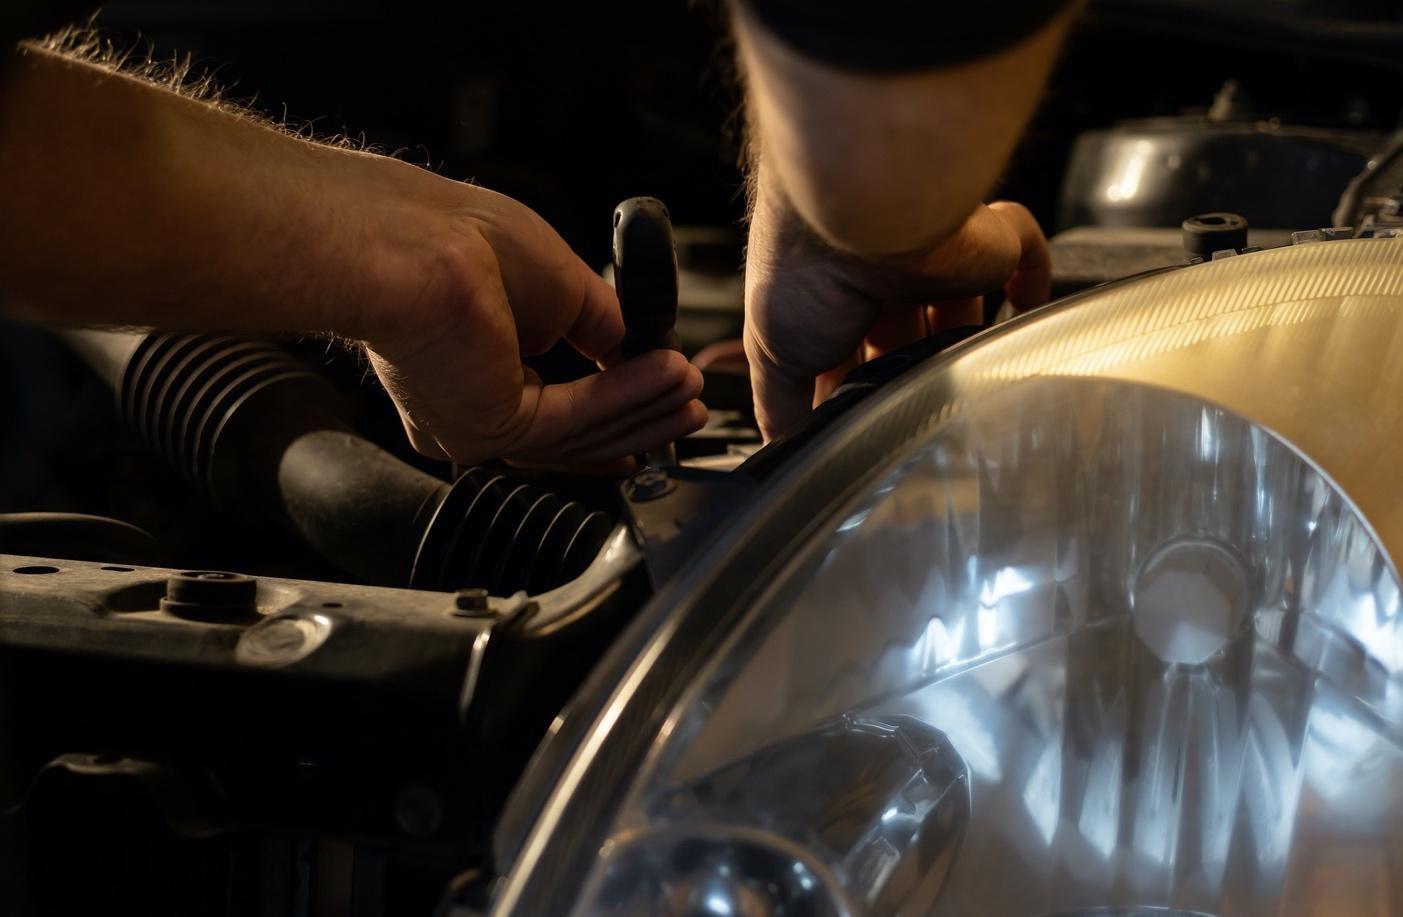 preventative maintenance tips